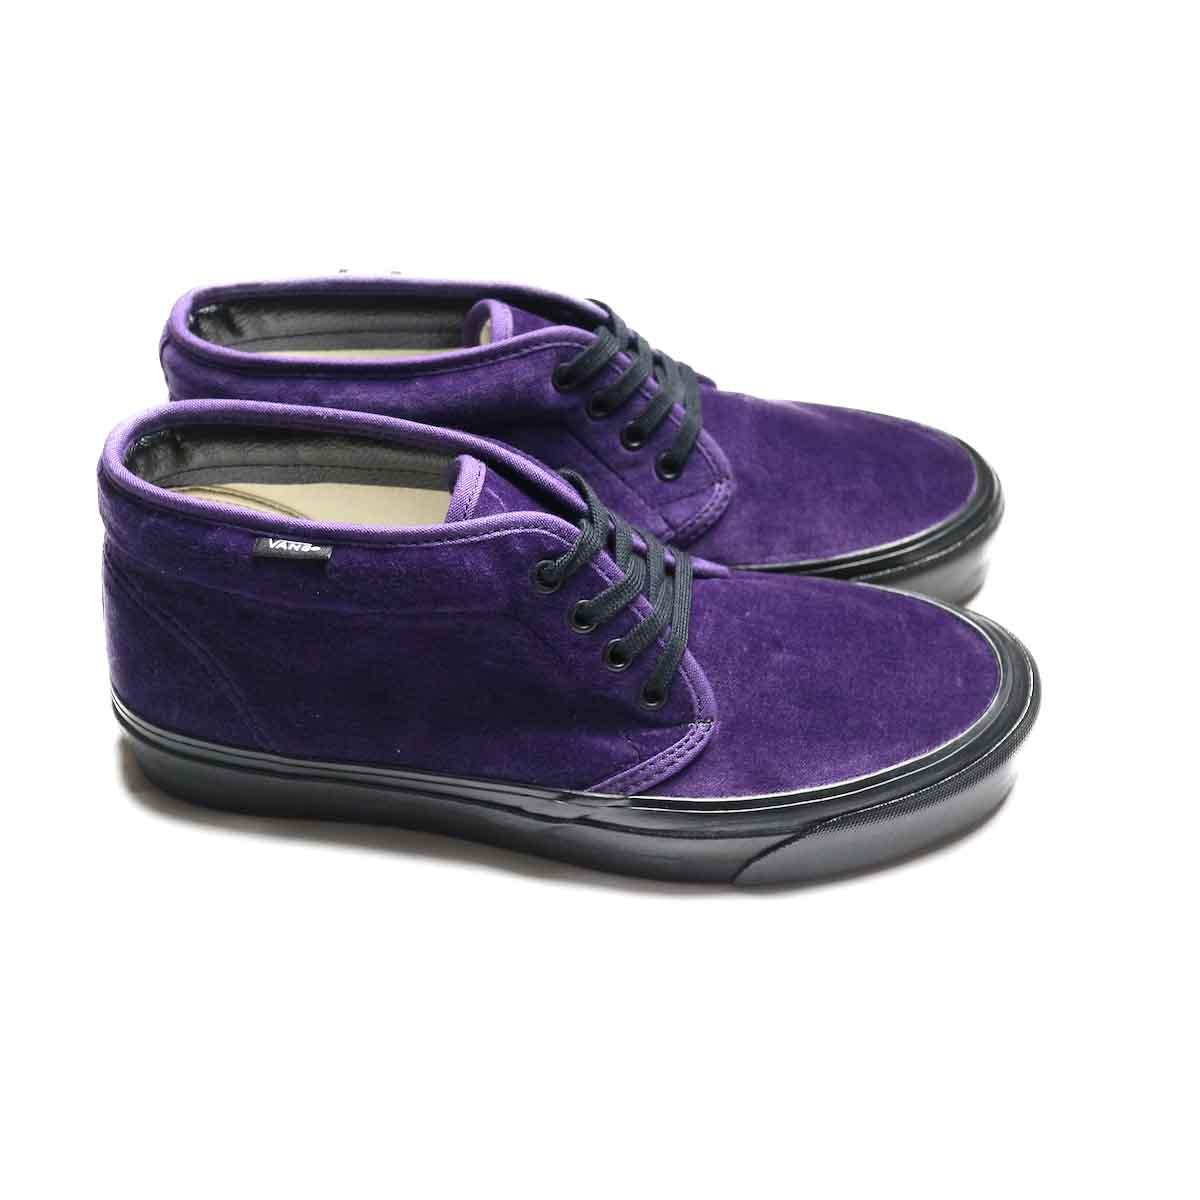 VANS / CHUKKA 49 DX (ANAHEIM FACTORY) (Purple VELVET)サイド